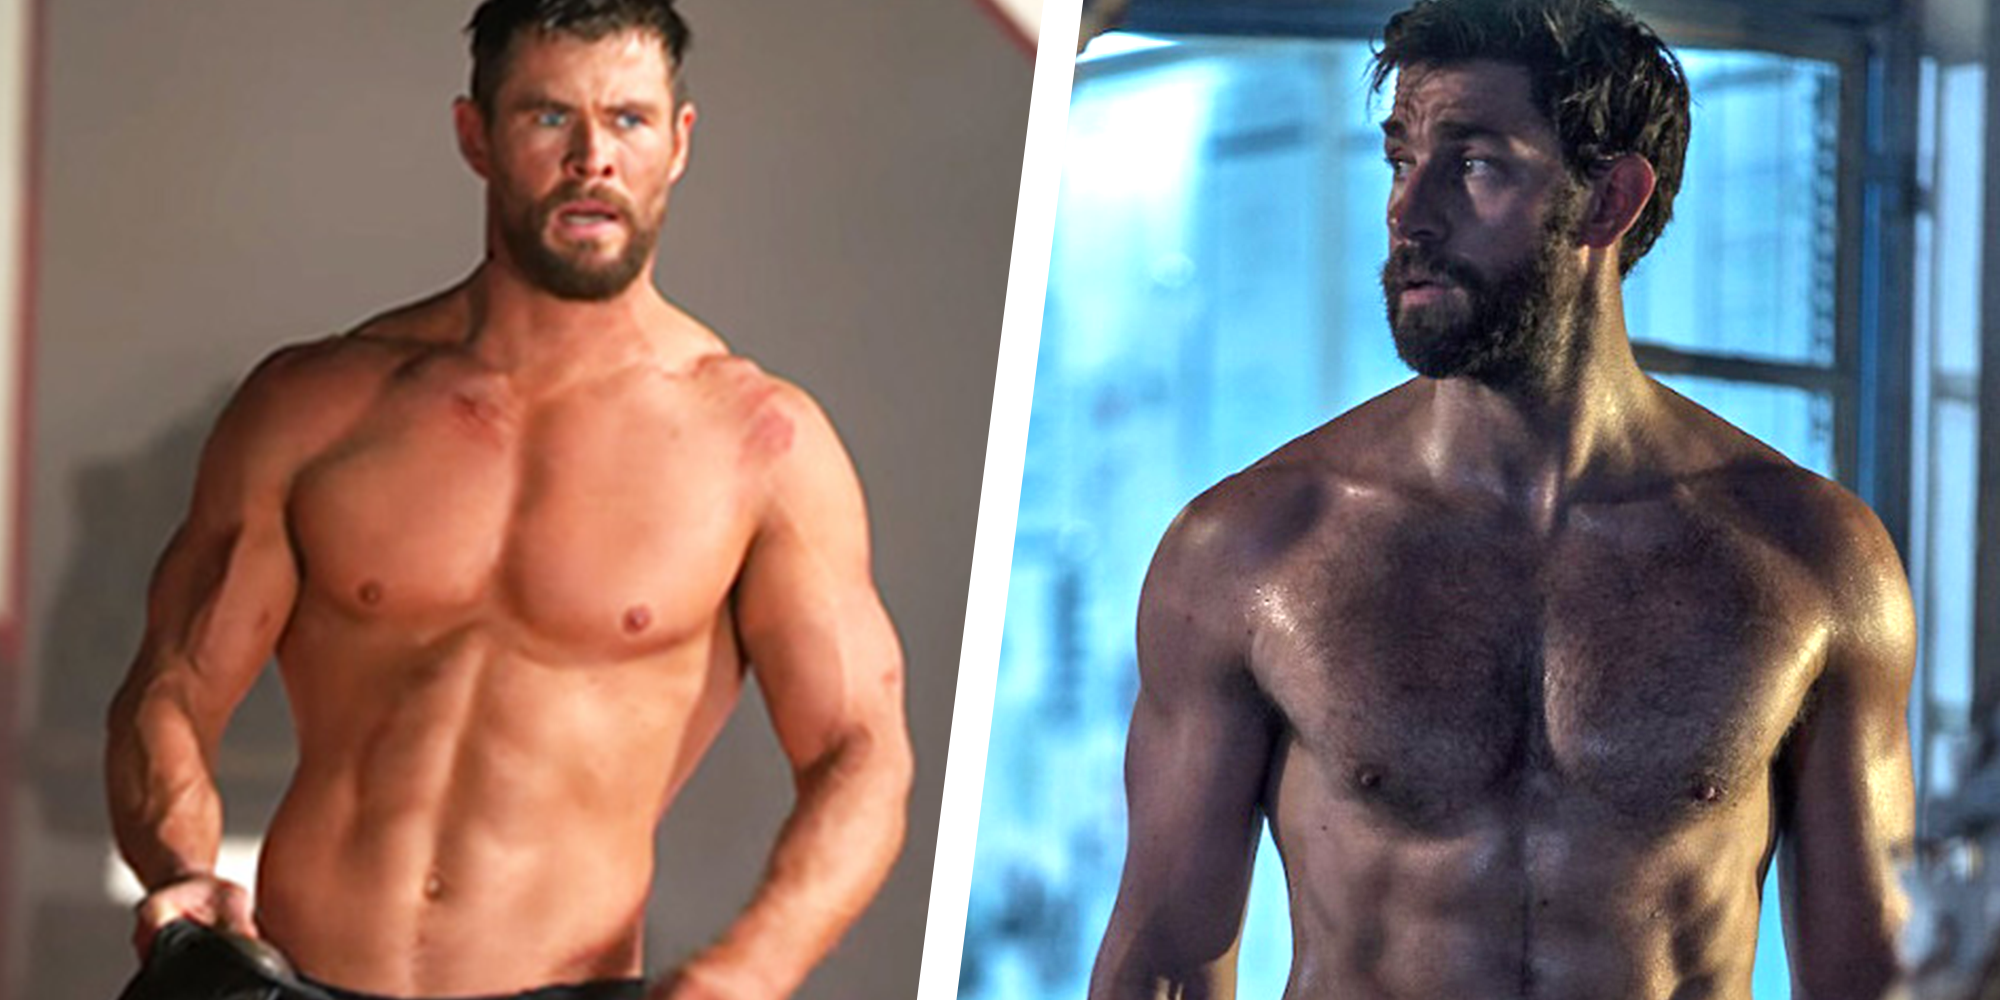 John Krasinski Says Chris Hemsworth Tanked His Captain America Audition